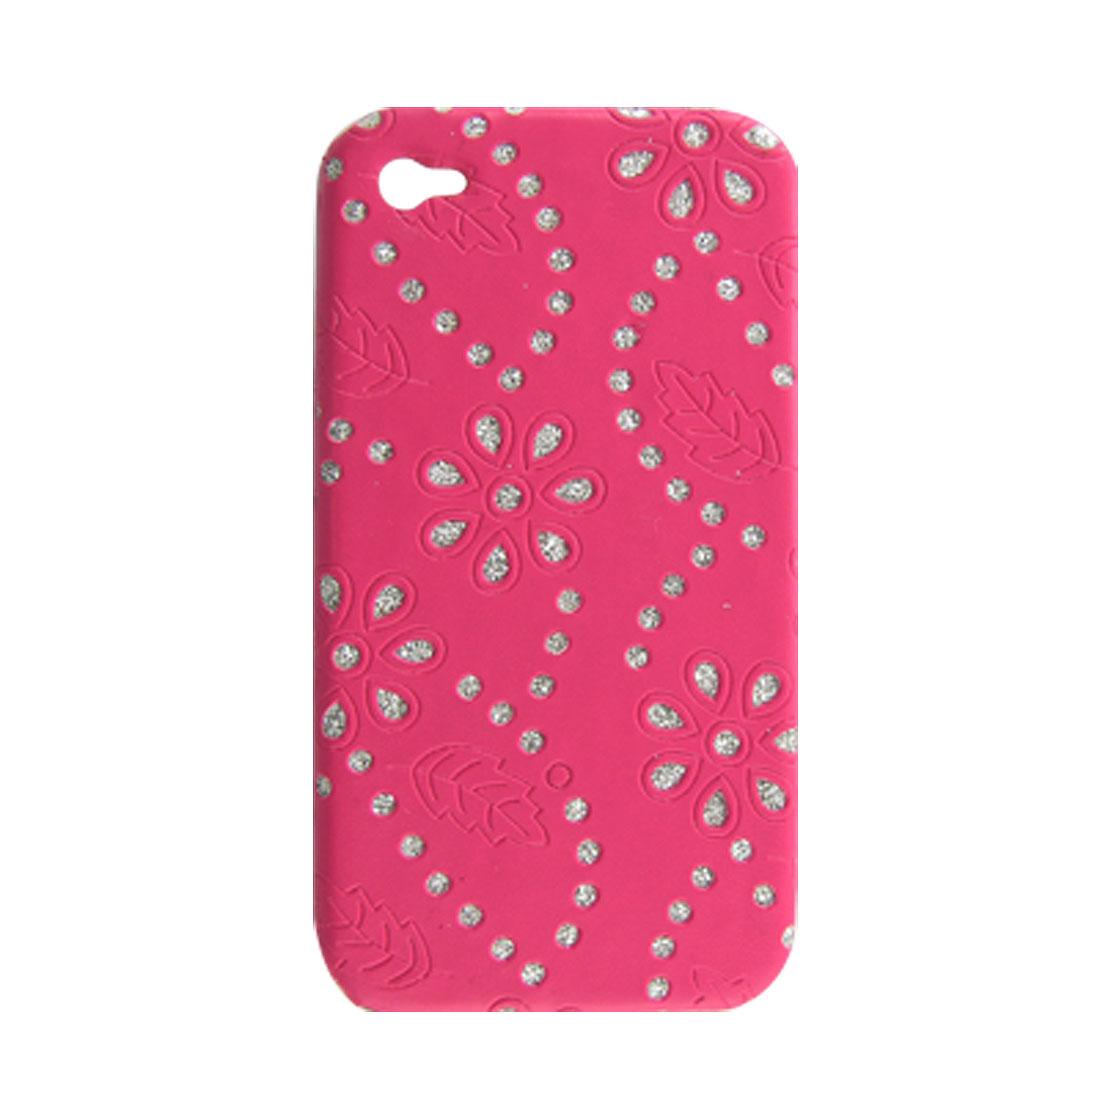 Glitter Rhinestone Flower Faux Leather Coated Plastic Back Case Fuchsia for iPhone 4 4G